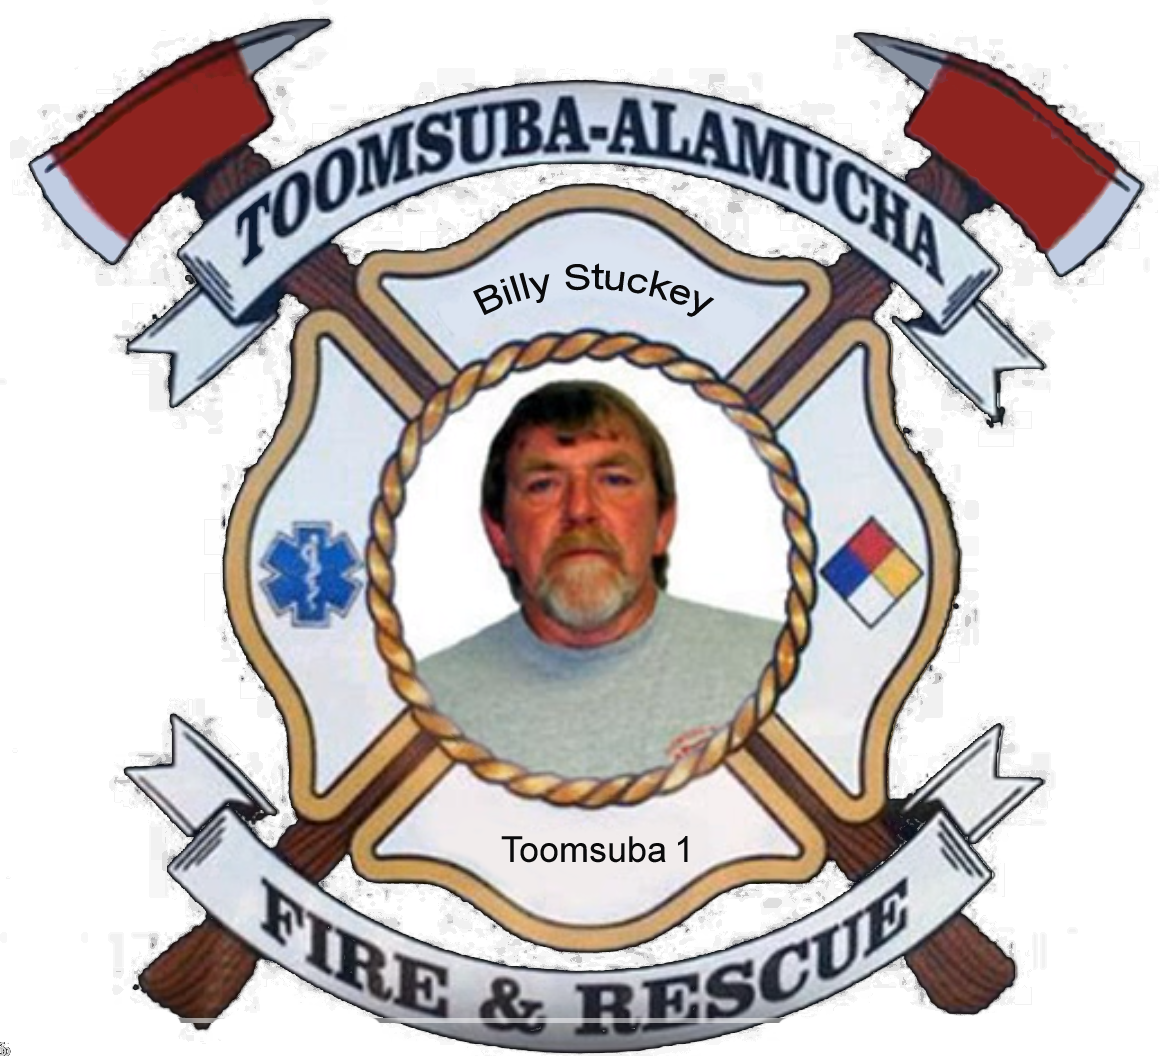 Billy Stuckey; Toomsuba Firefighter